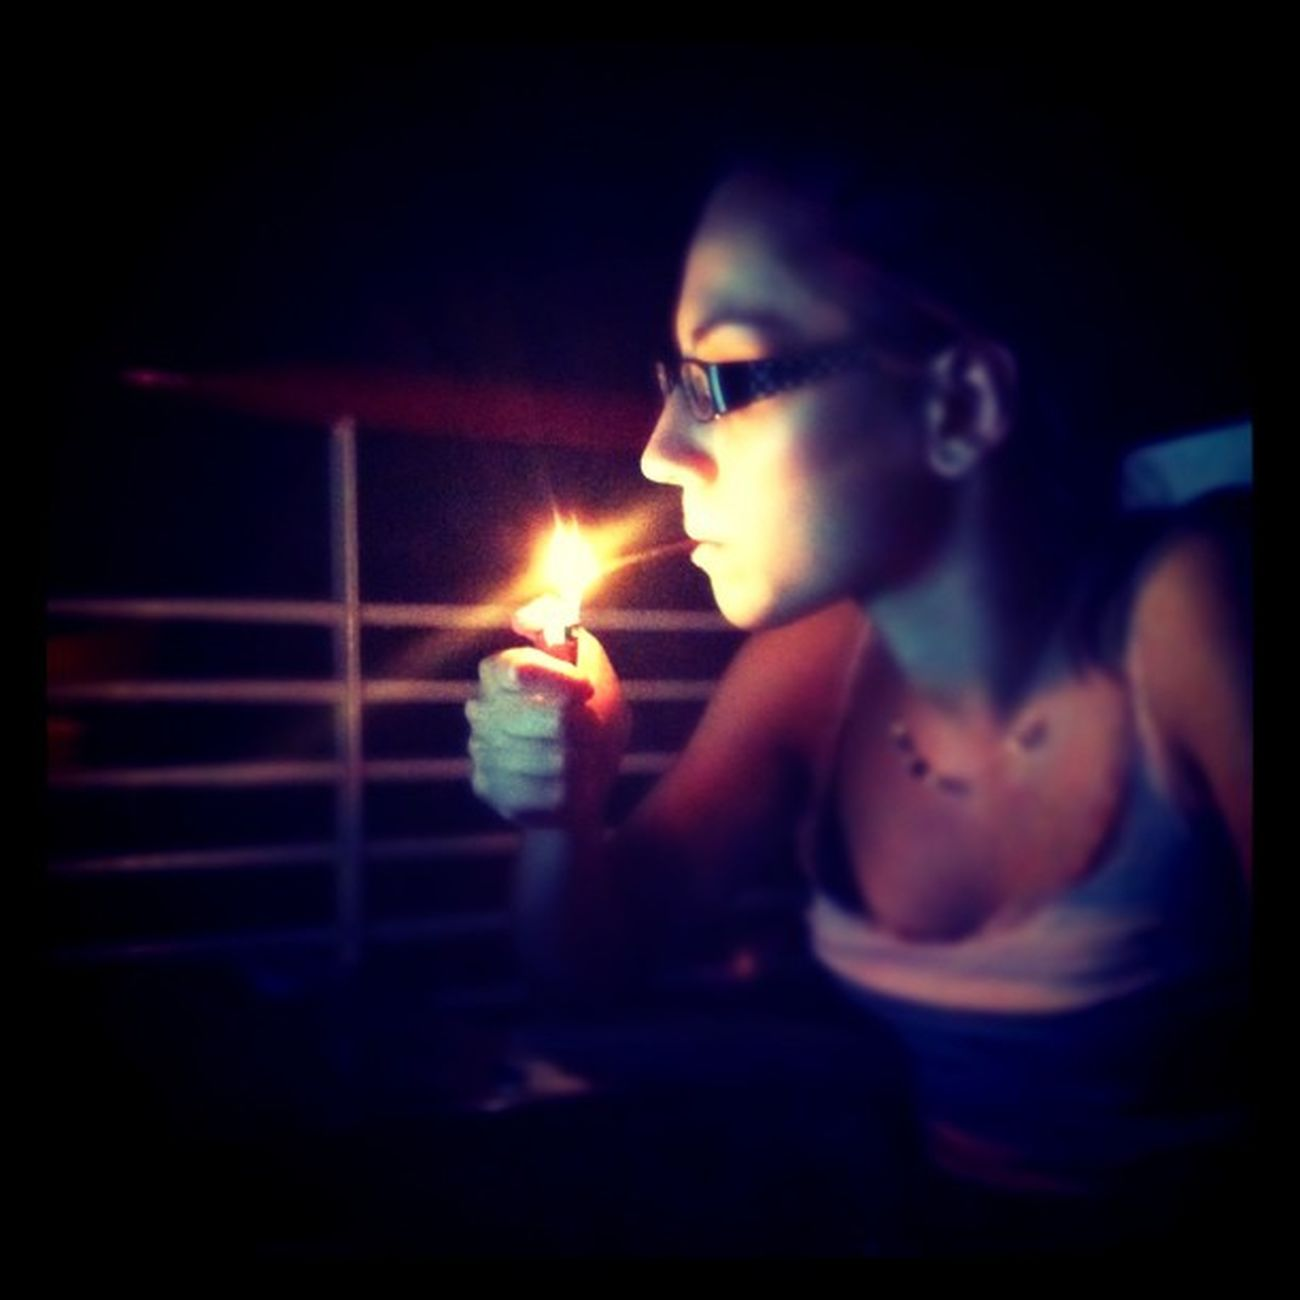 Set my night on fire